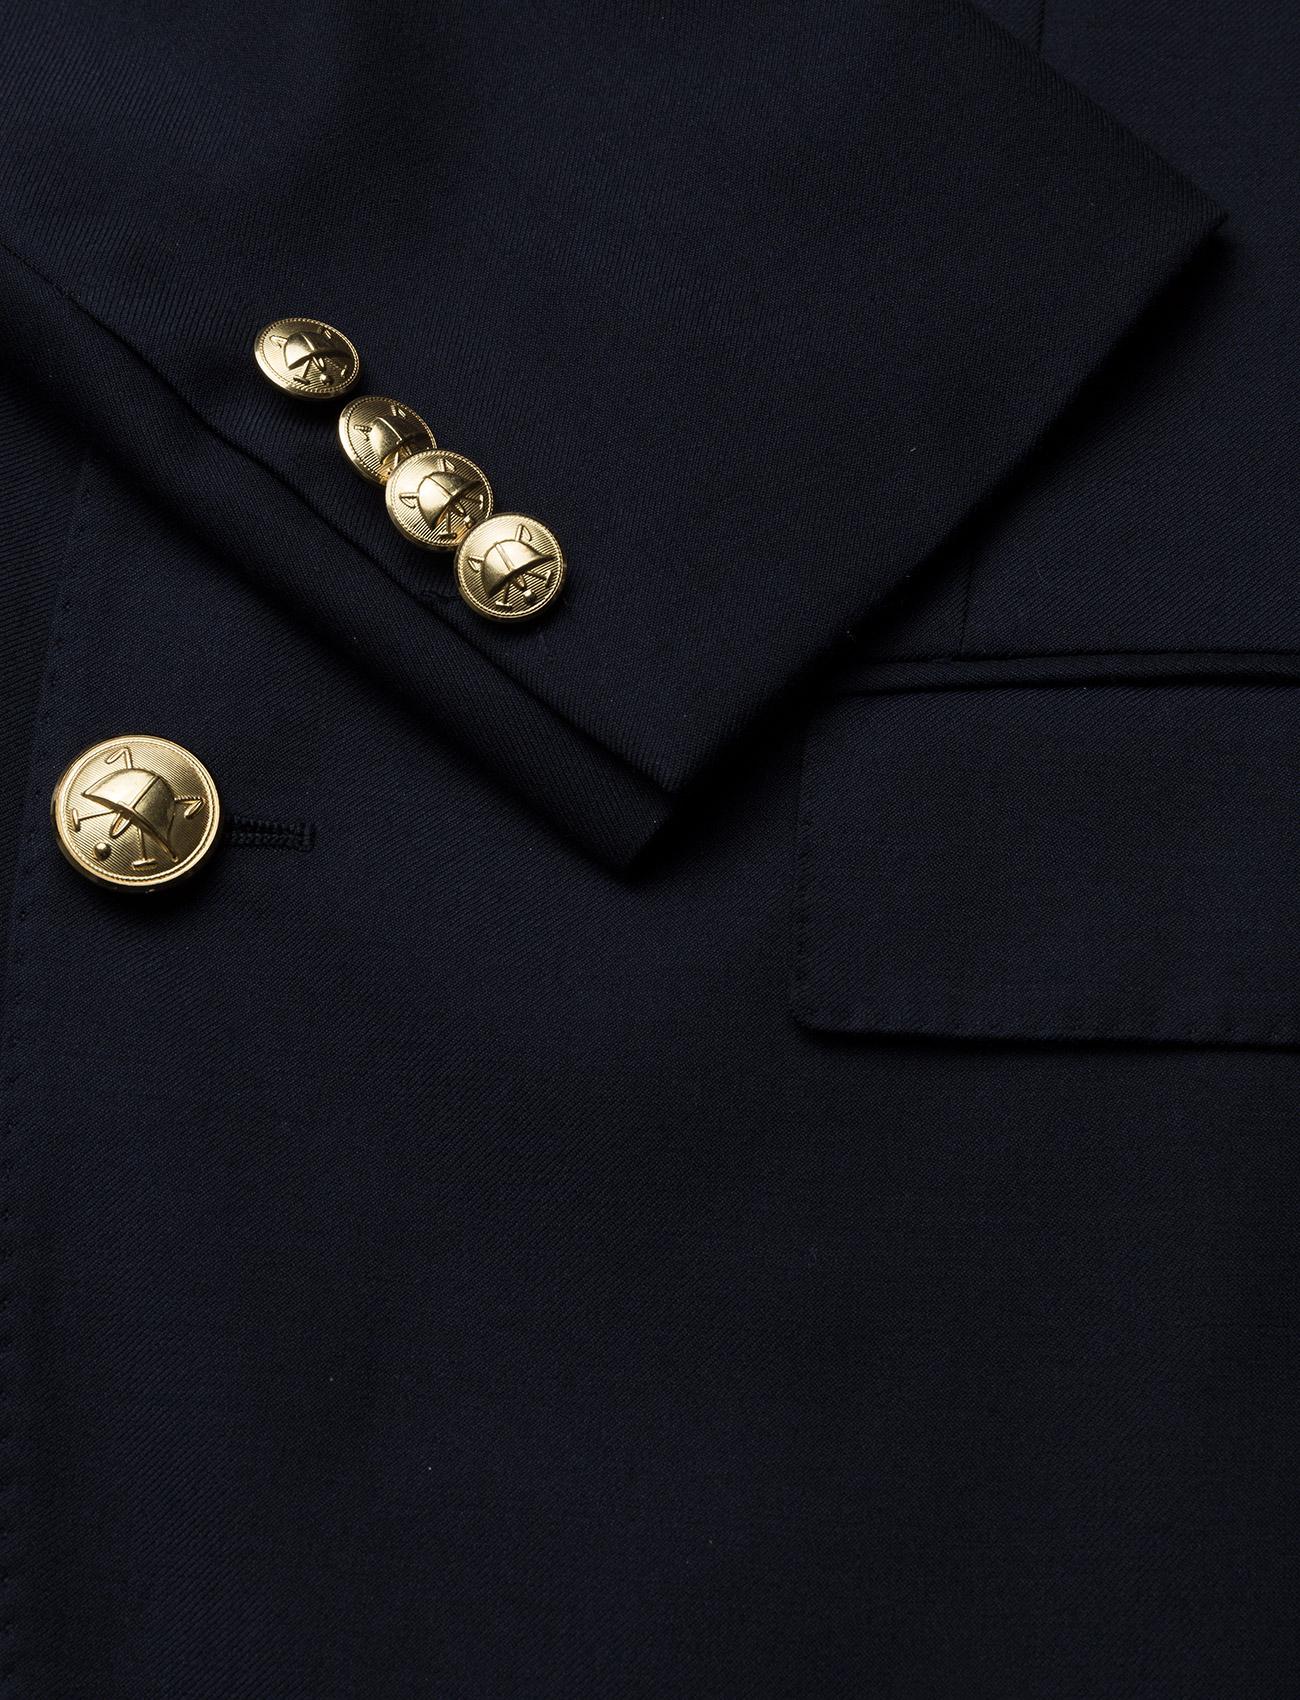 Lauren Sport Polo Twill Wool NavyRalph Coatclassic nN8wv0m